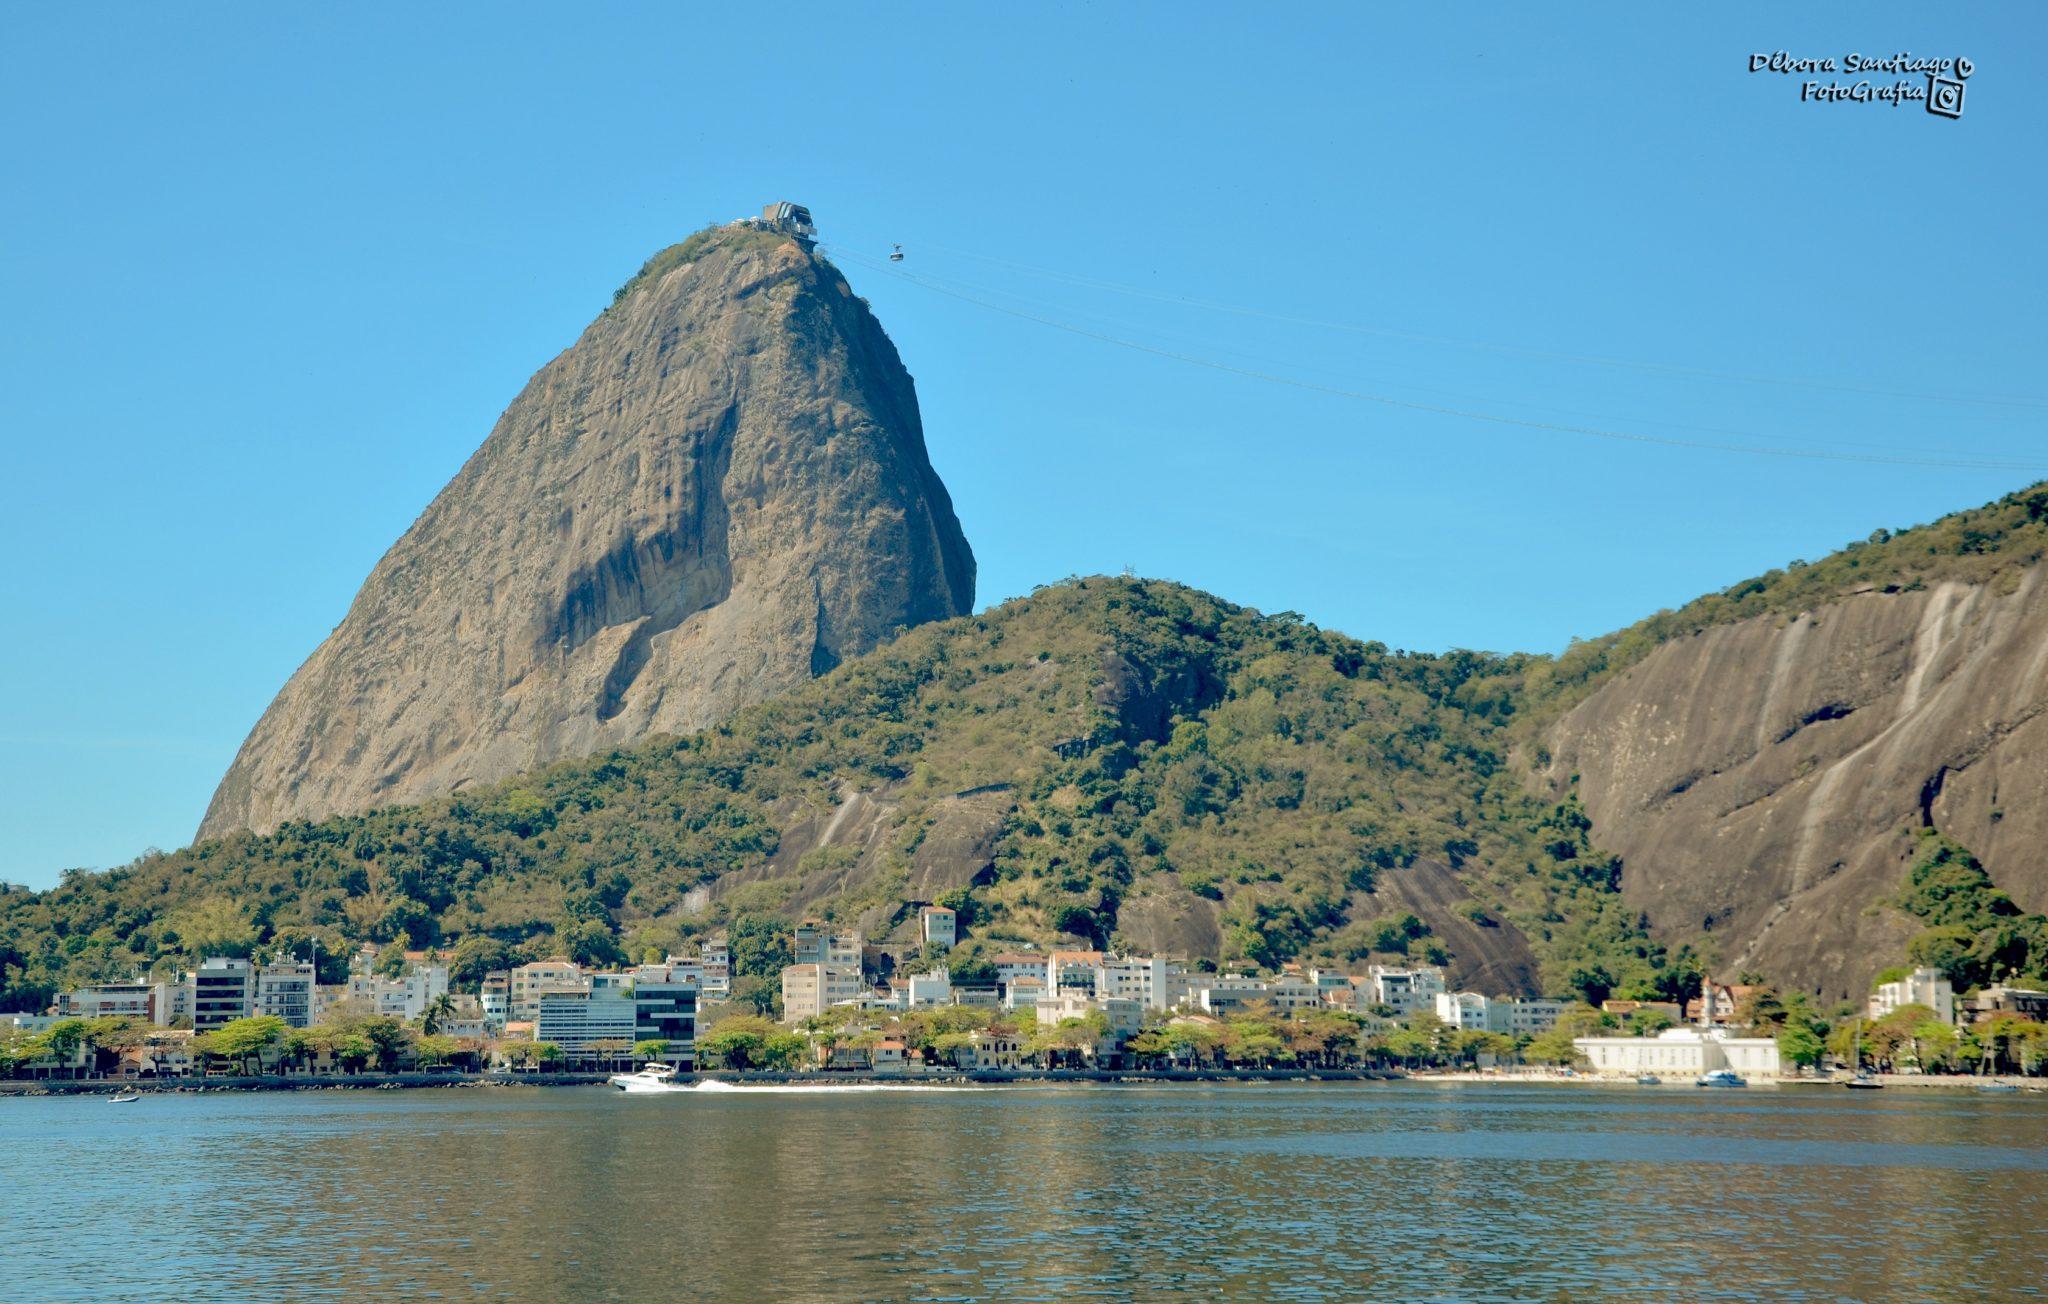 Rio de Janeiro gastando pouco